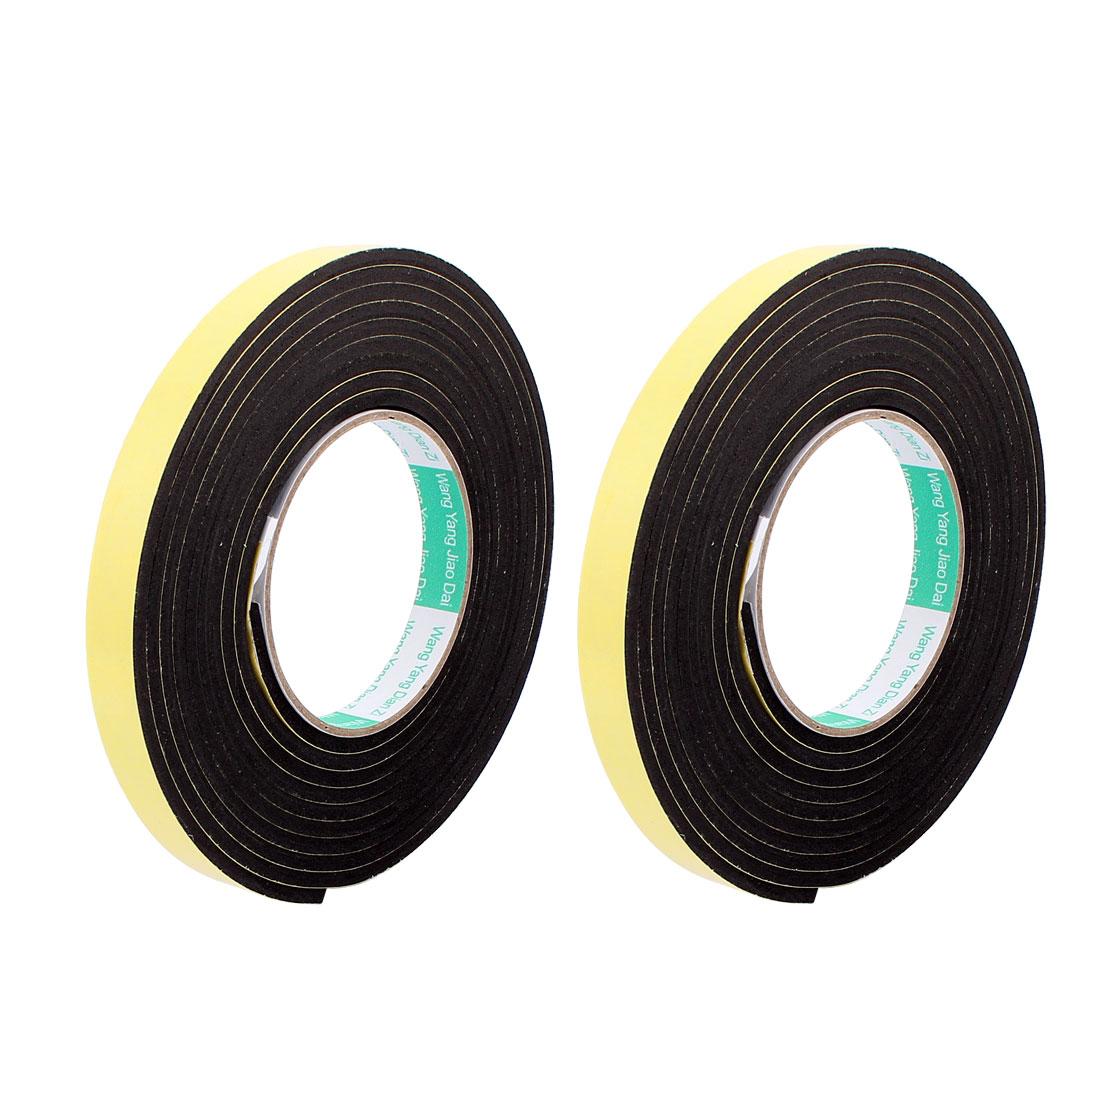 2Pcs 1.5CM Width 3 Meters Length 4MM Thick Single Sided Sealing Shockproof Sponge Tape